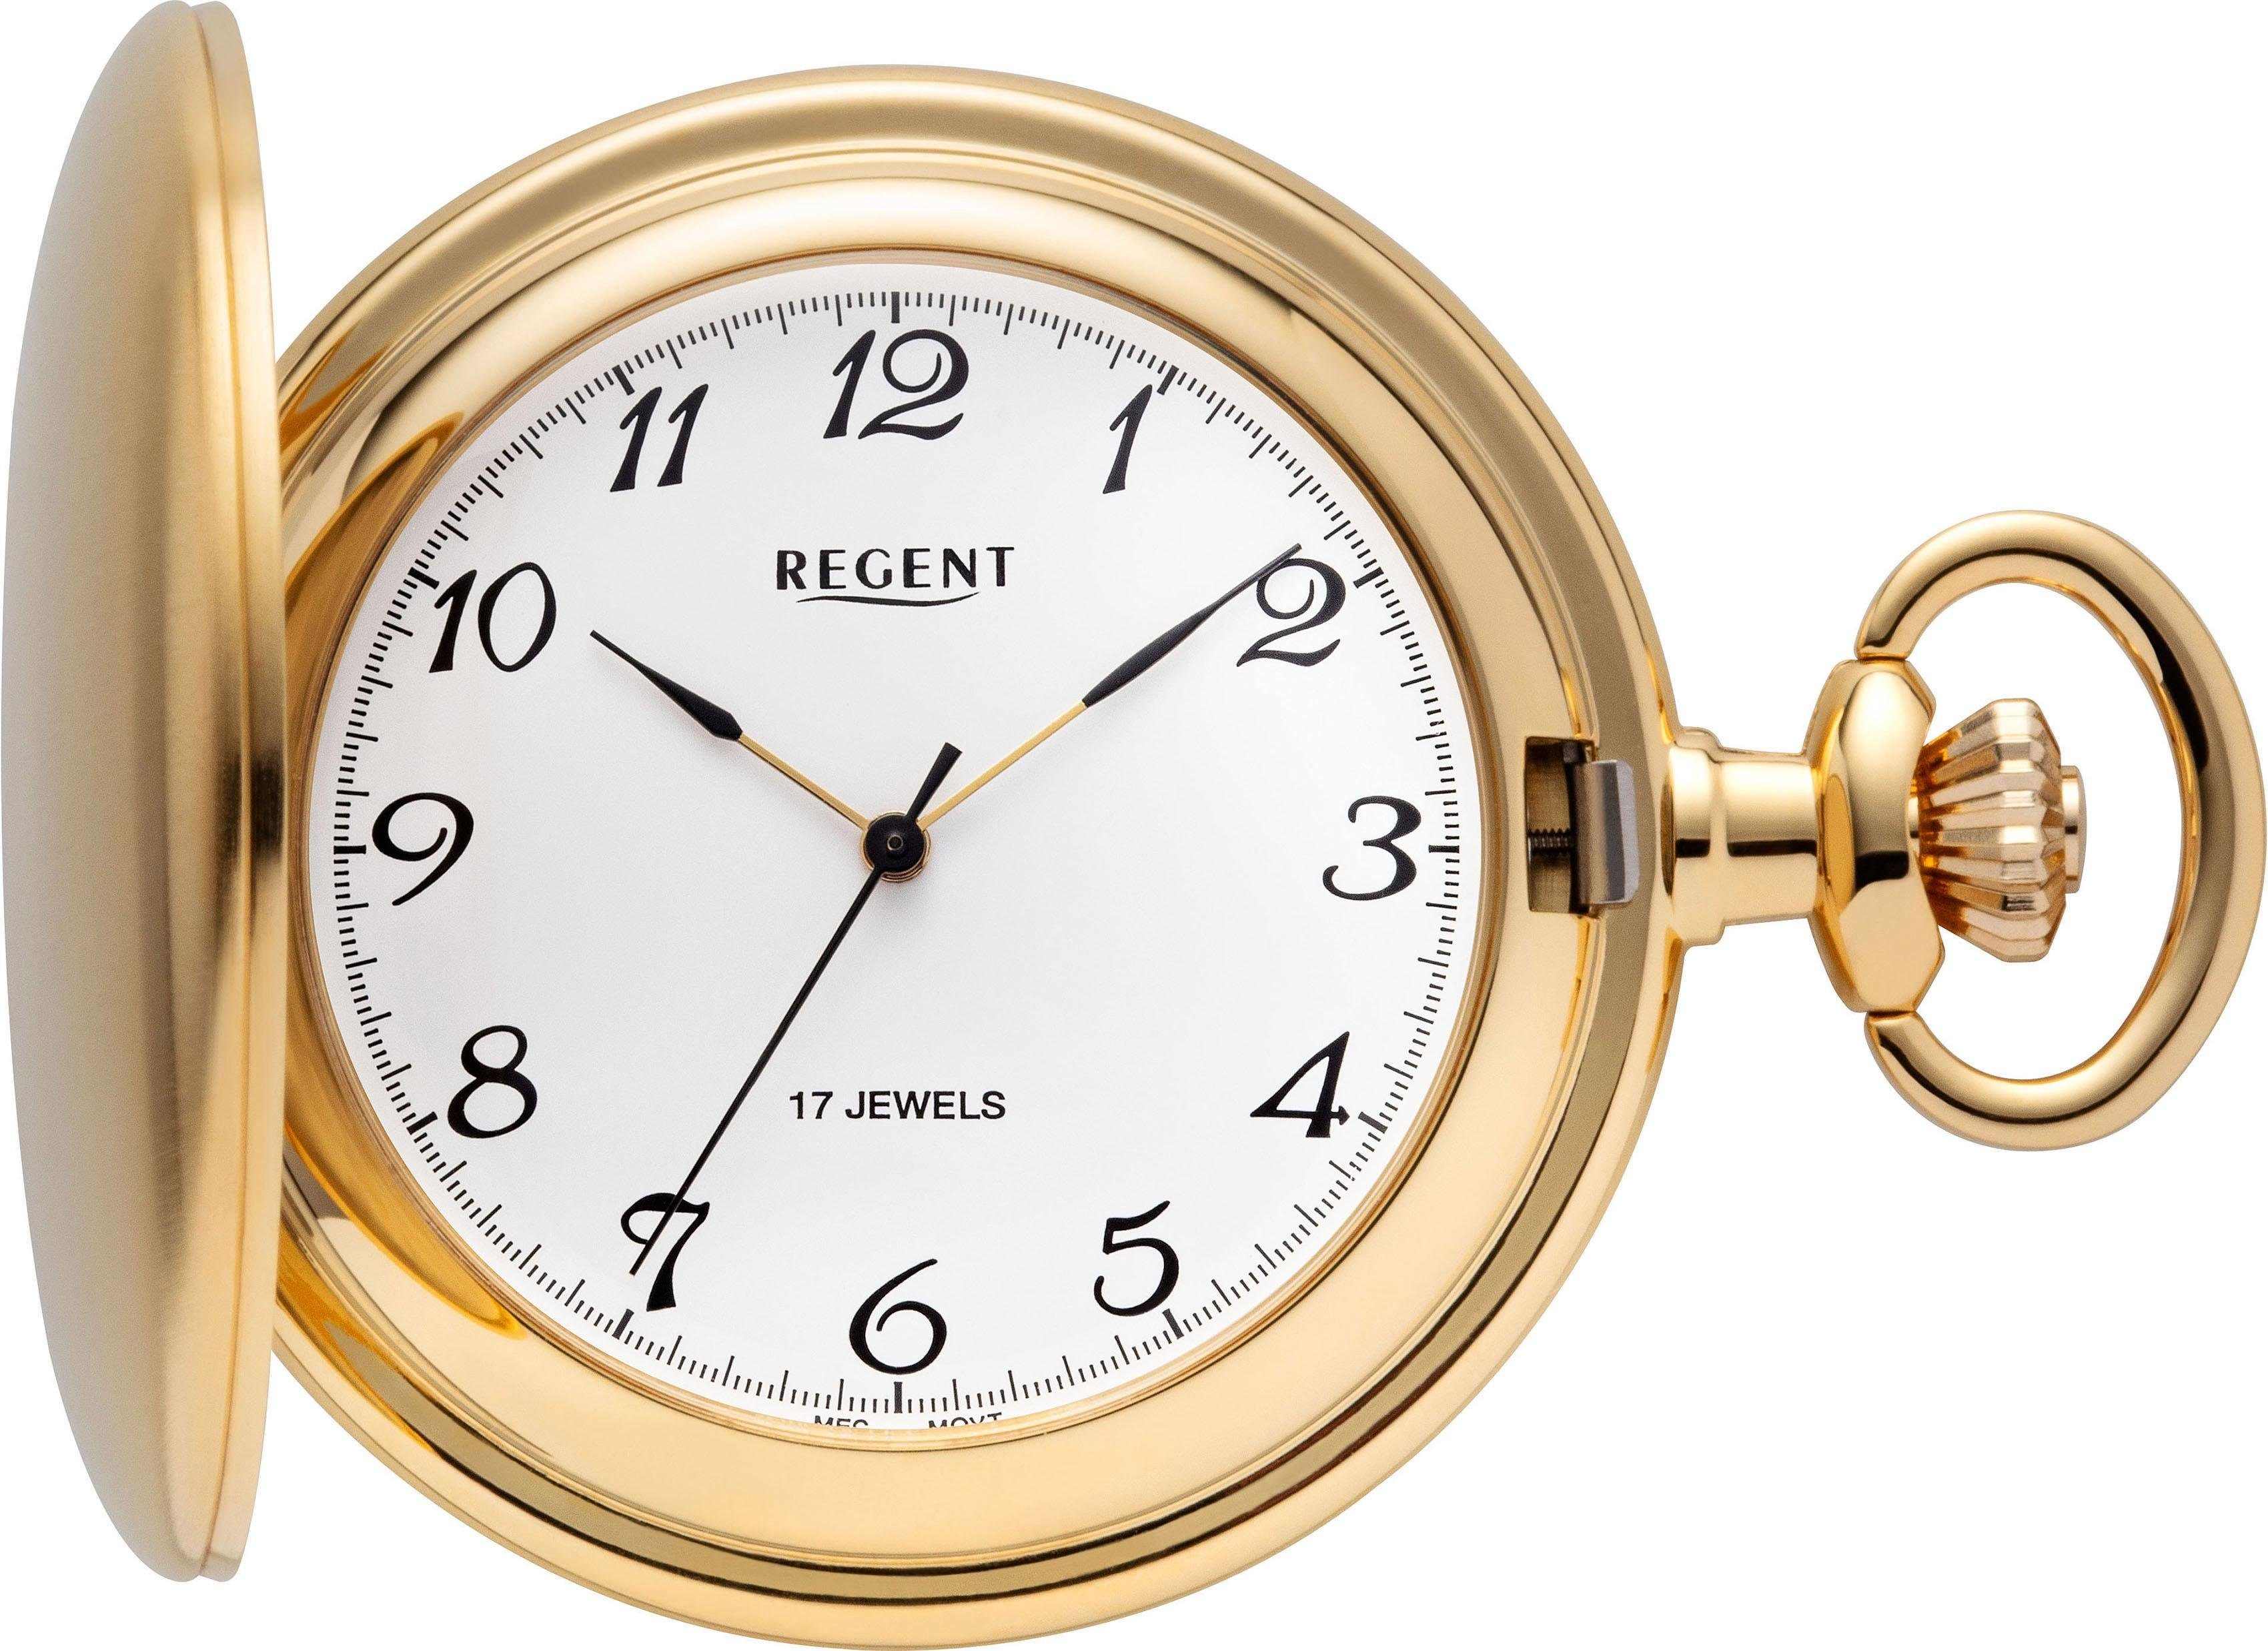 Regent Taschenuhr »P04« (Set, 2 tlg) inkl. Kette